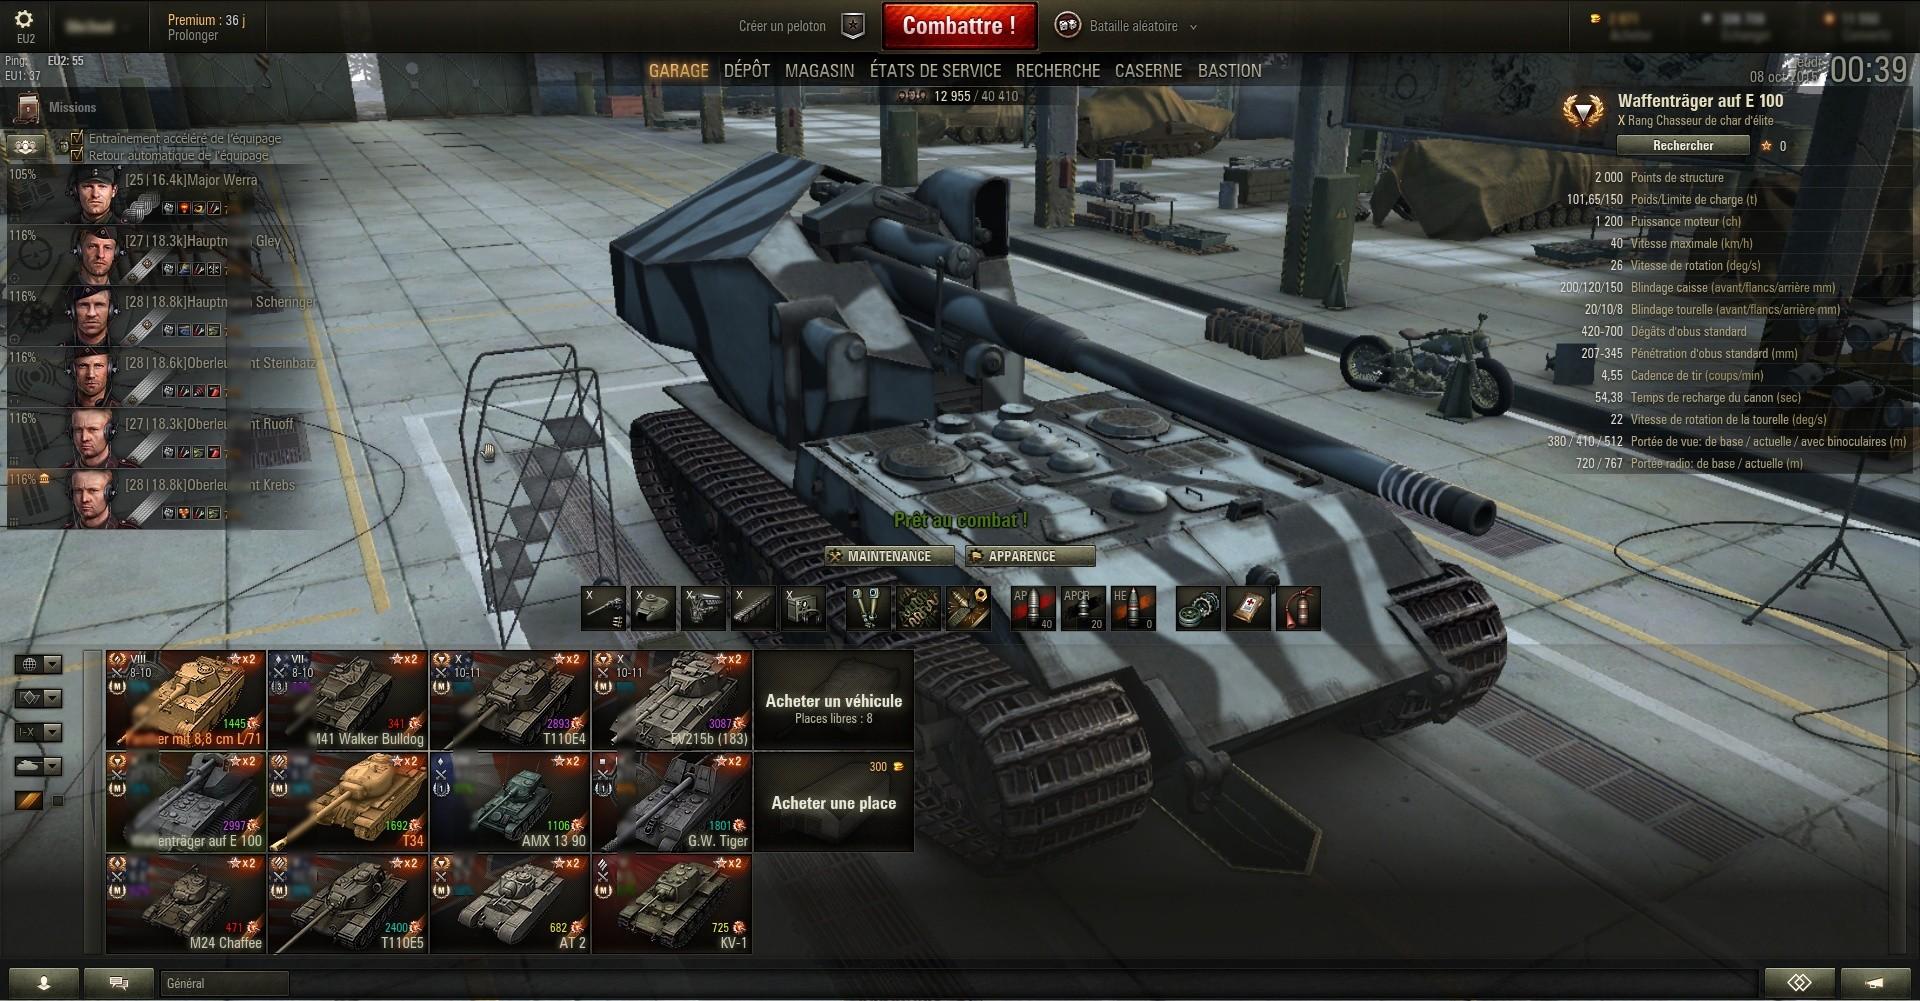 world of tanks log in